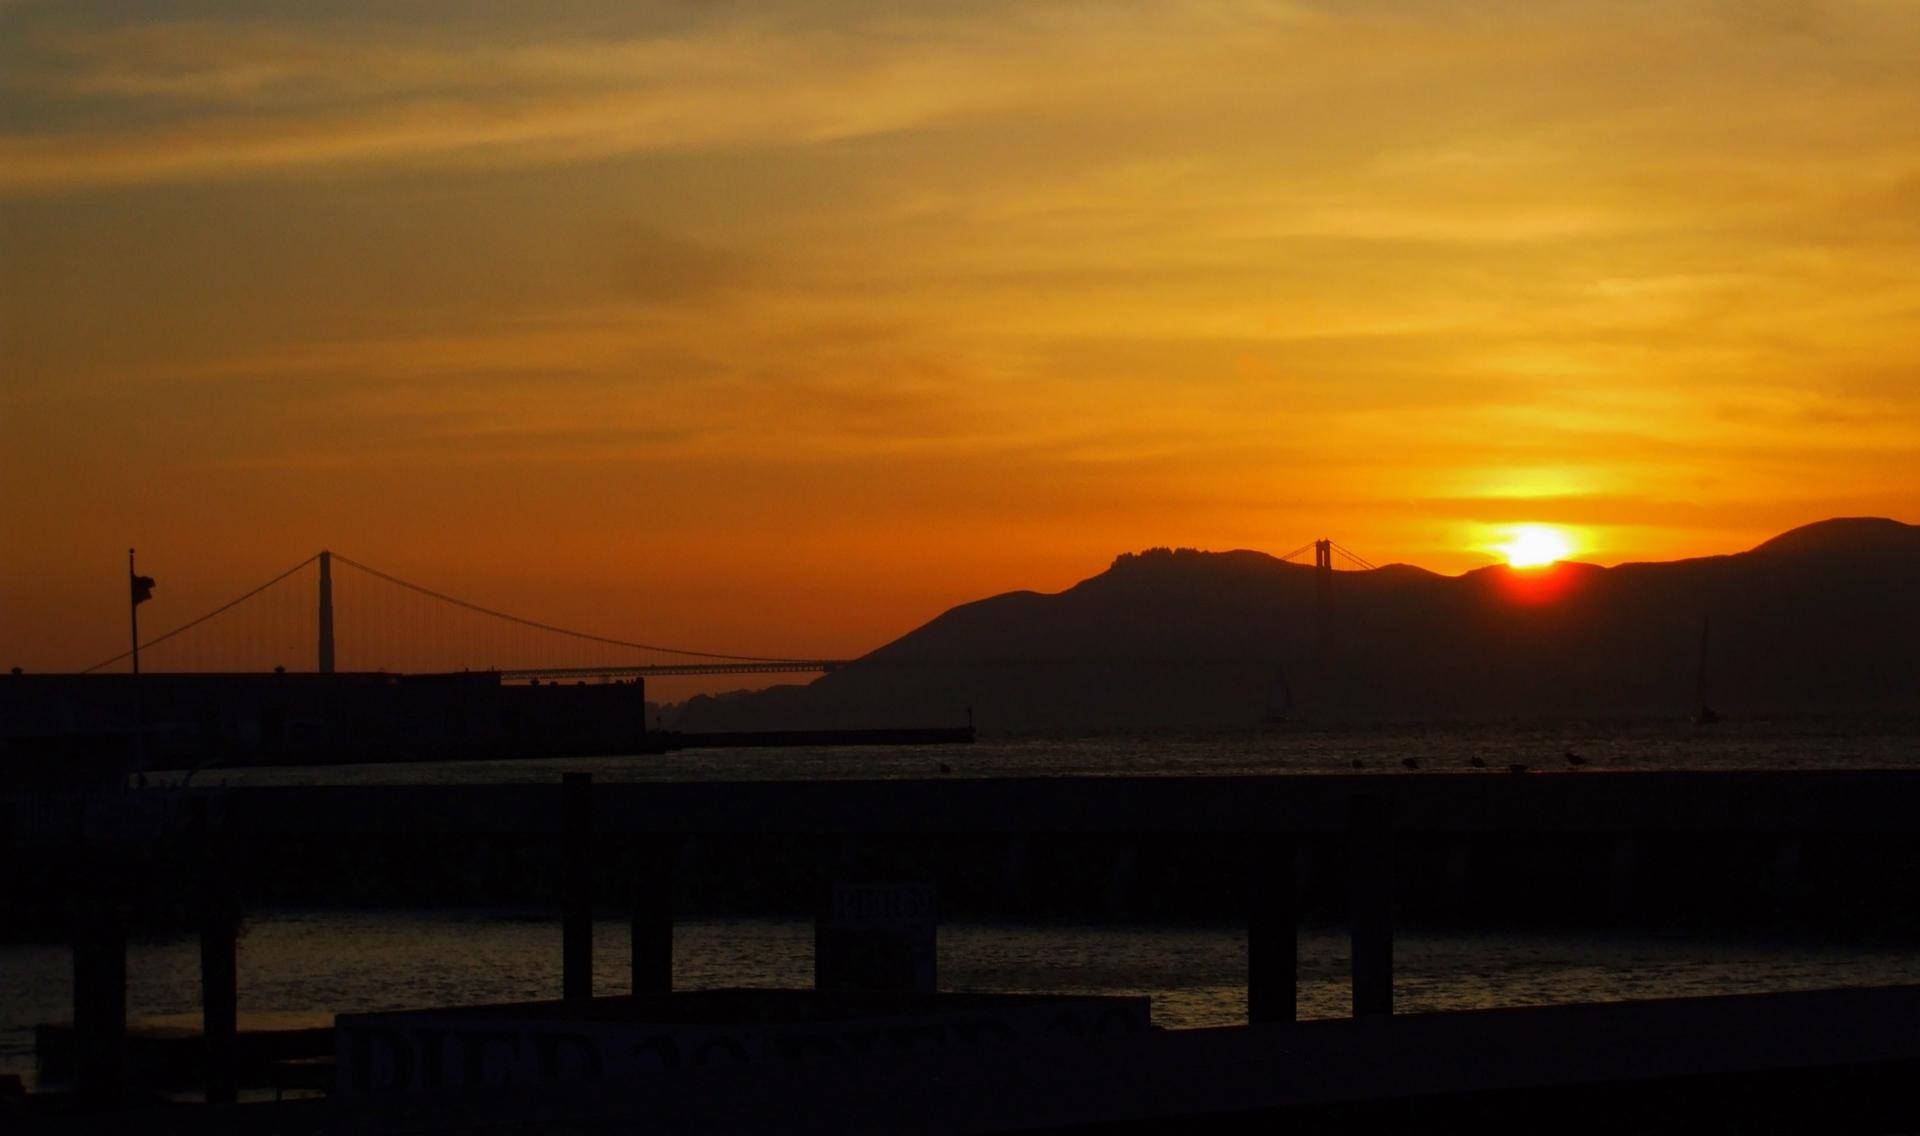 golden sunset in san Francisco,  California